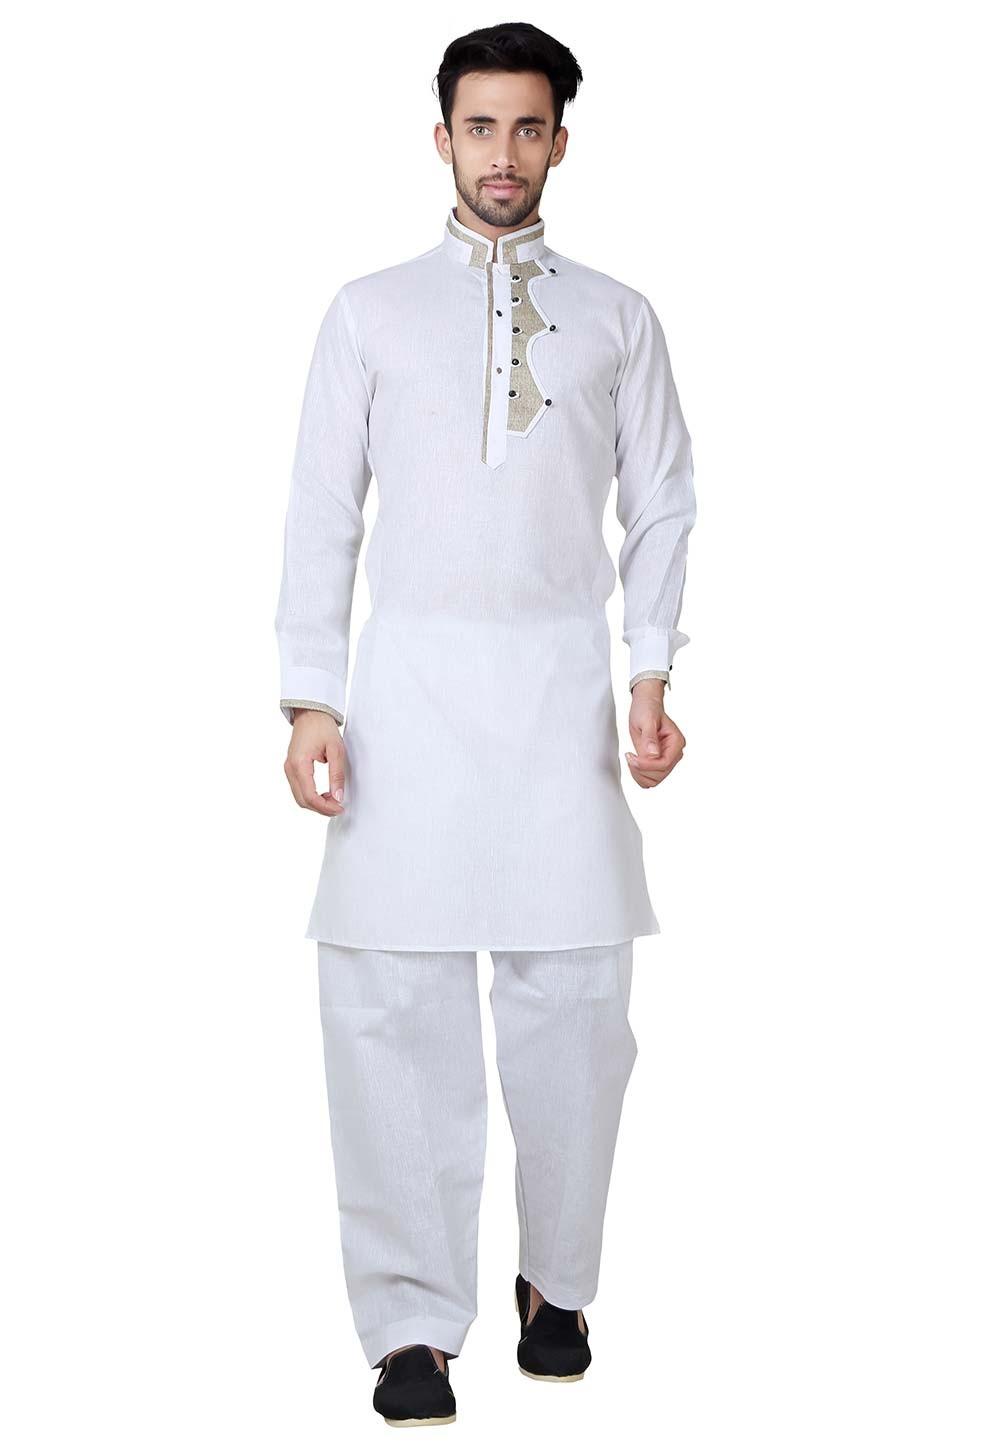 Exquisite White Color Pathani Kurta Pajama Online